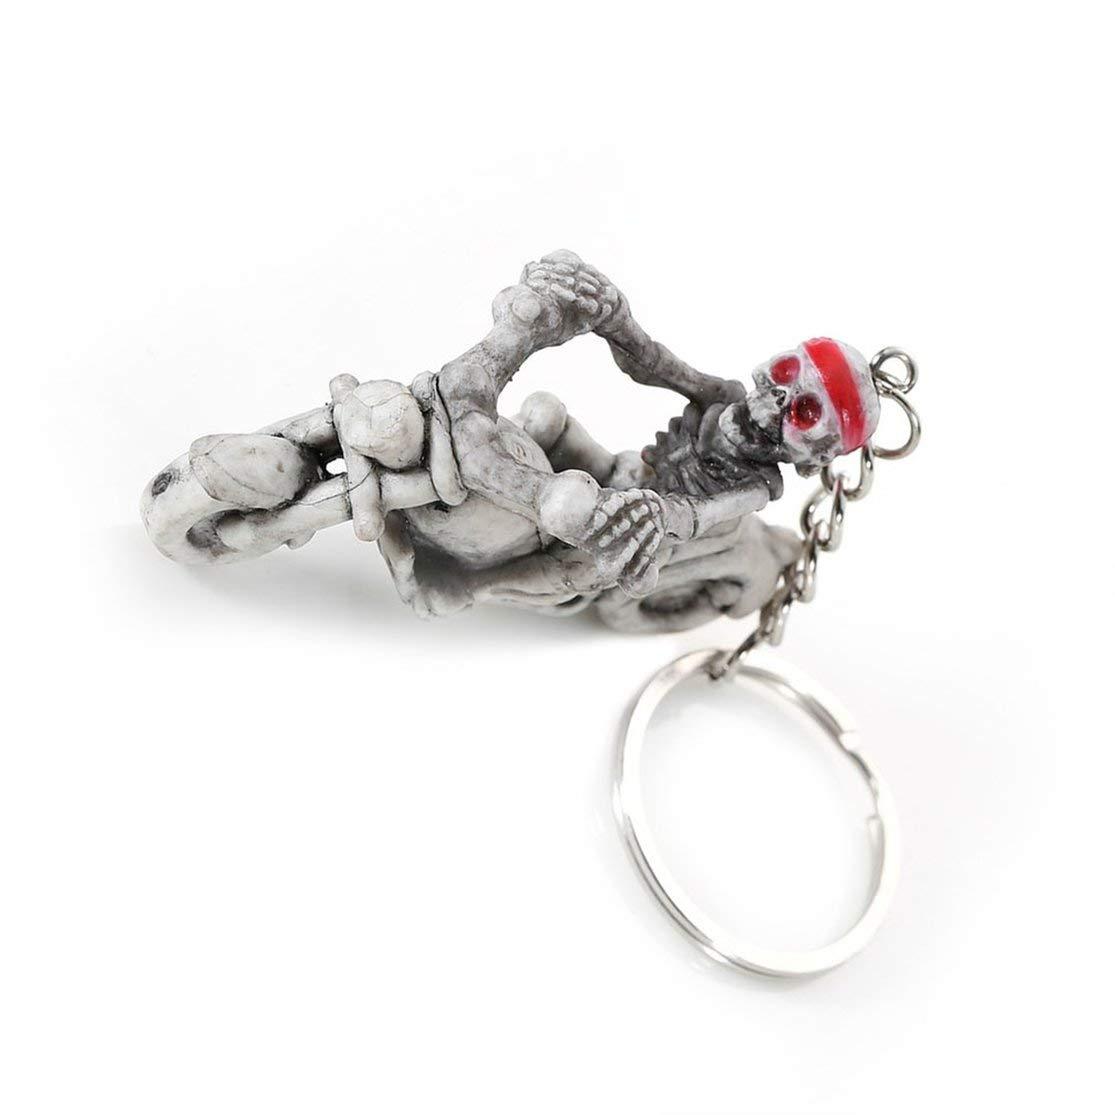 Fashion Key Organizer Holder Key Clip Smart Flexible Key Chains Case Keycha VG